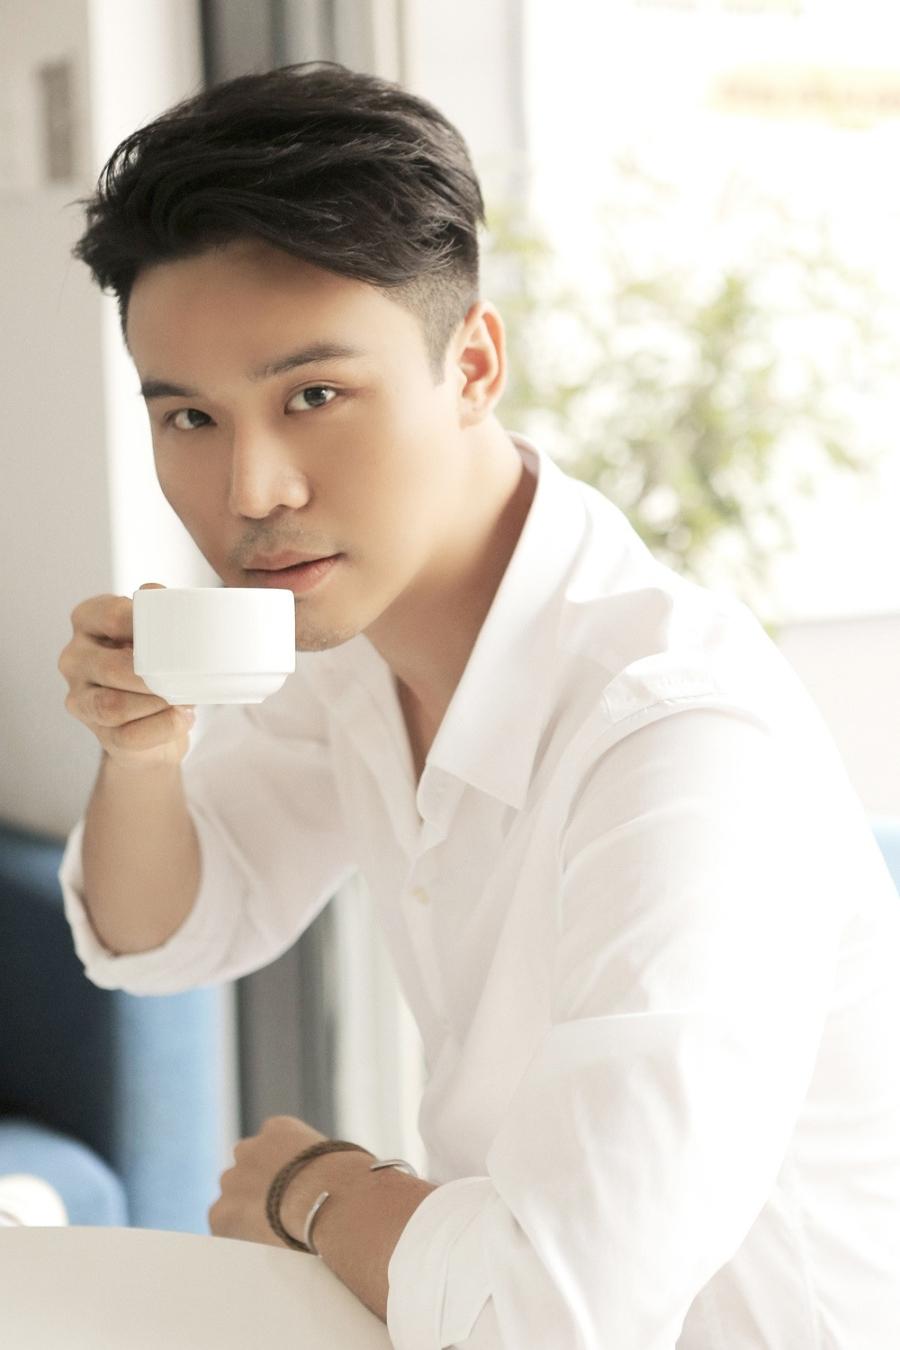 9X dien trai lam giam doc sang tao show dien de doi cho Mr. Dam la ai? hinh anh 7